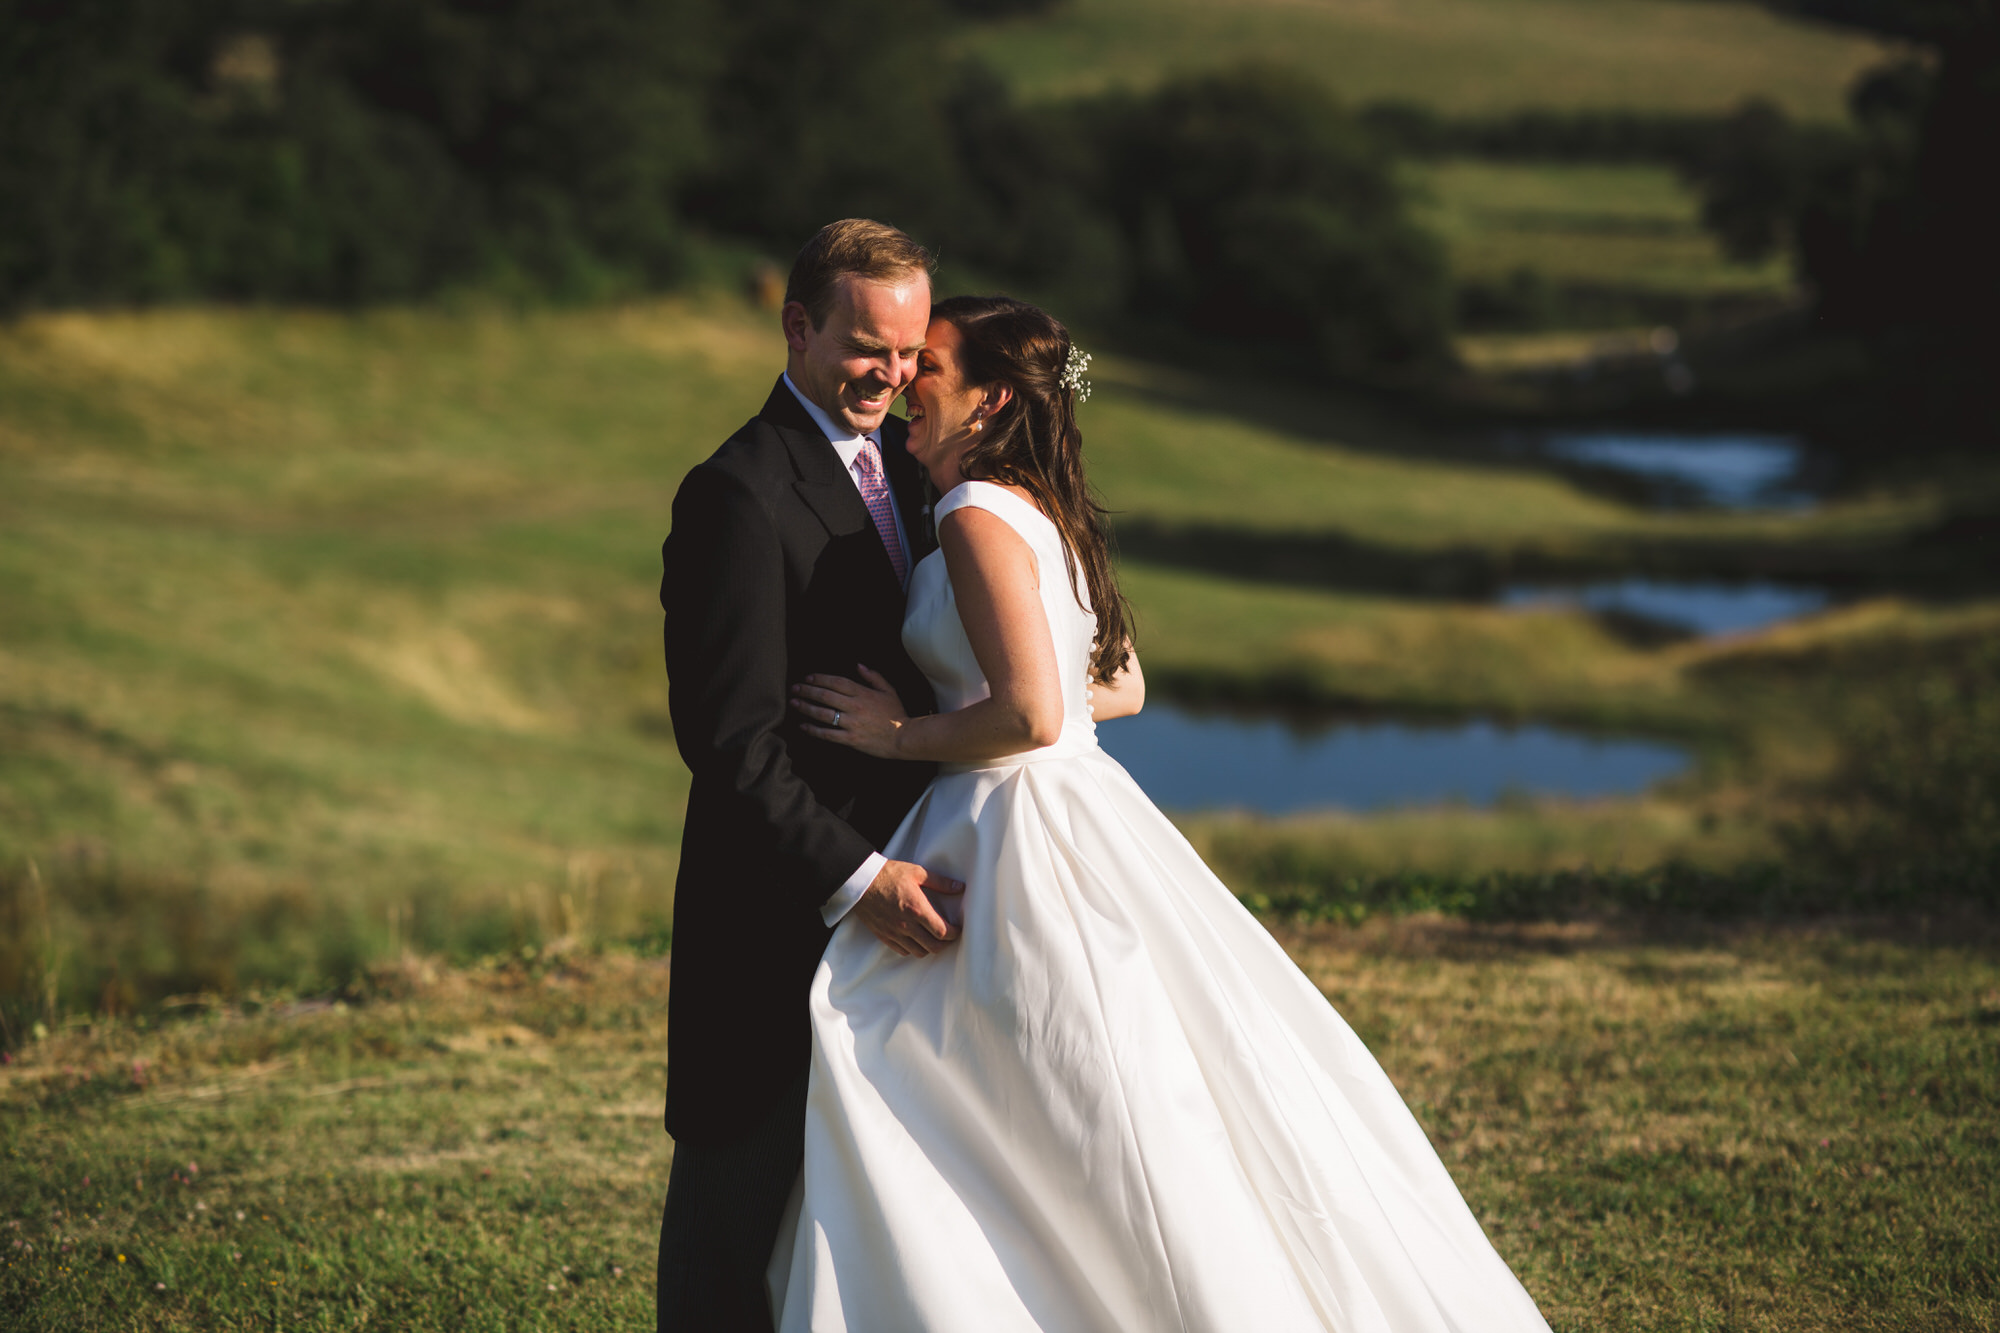 Shilstone wedding photographer